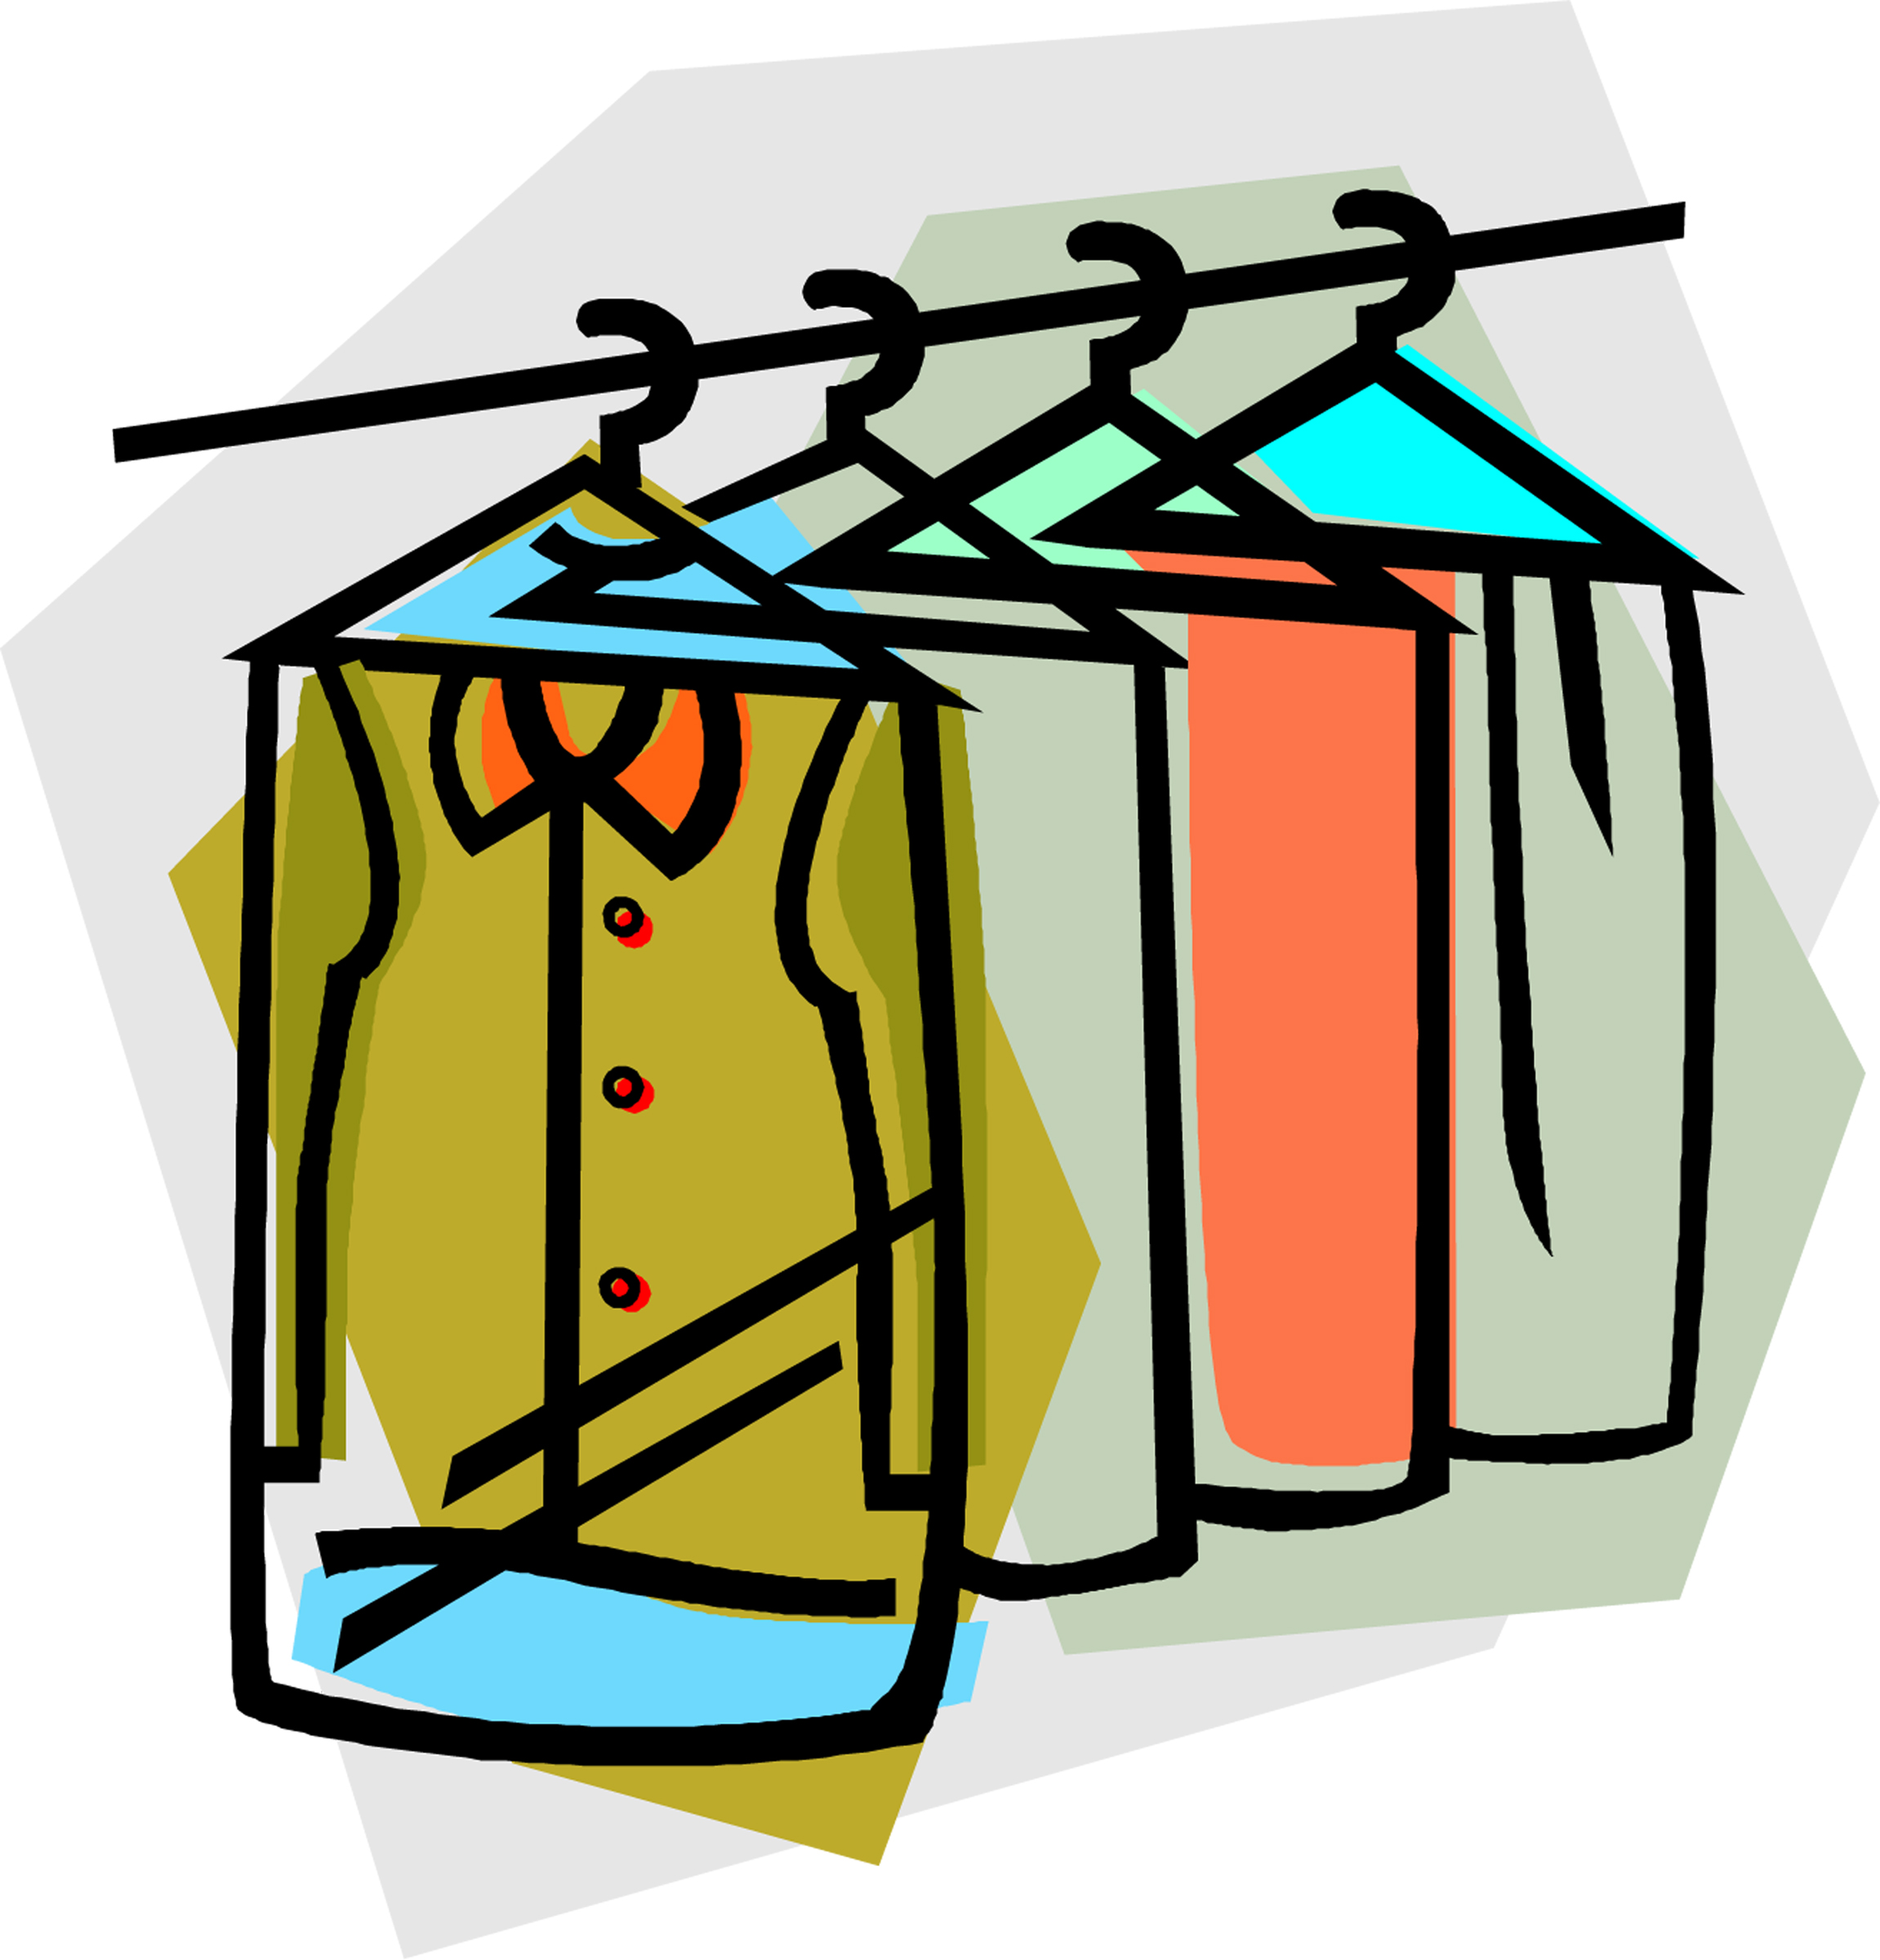 Closet clipart professional clothes. Free download best